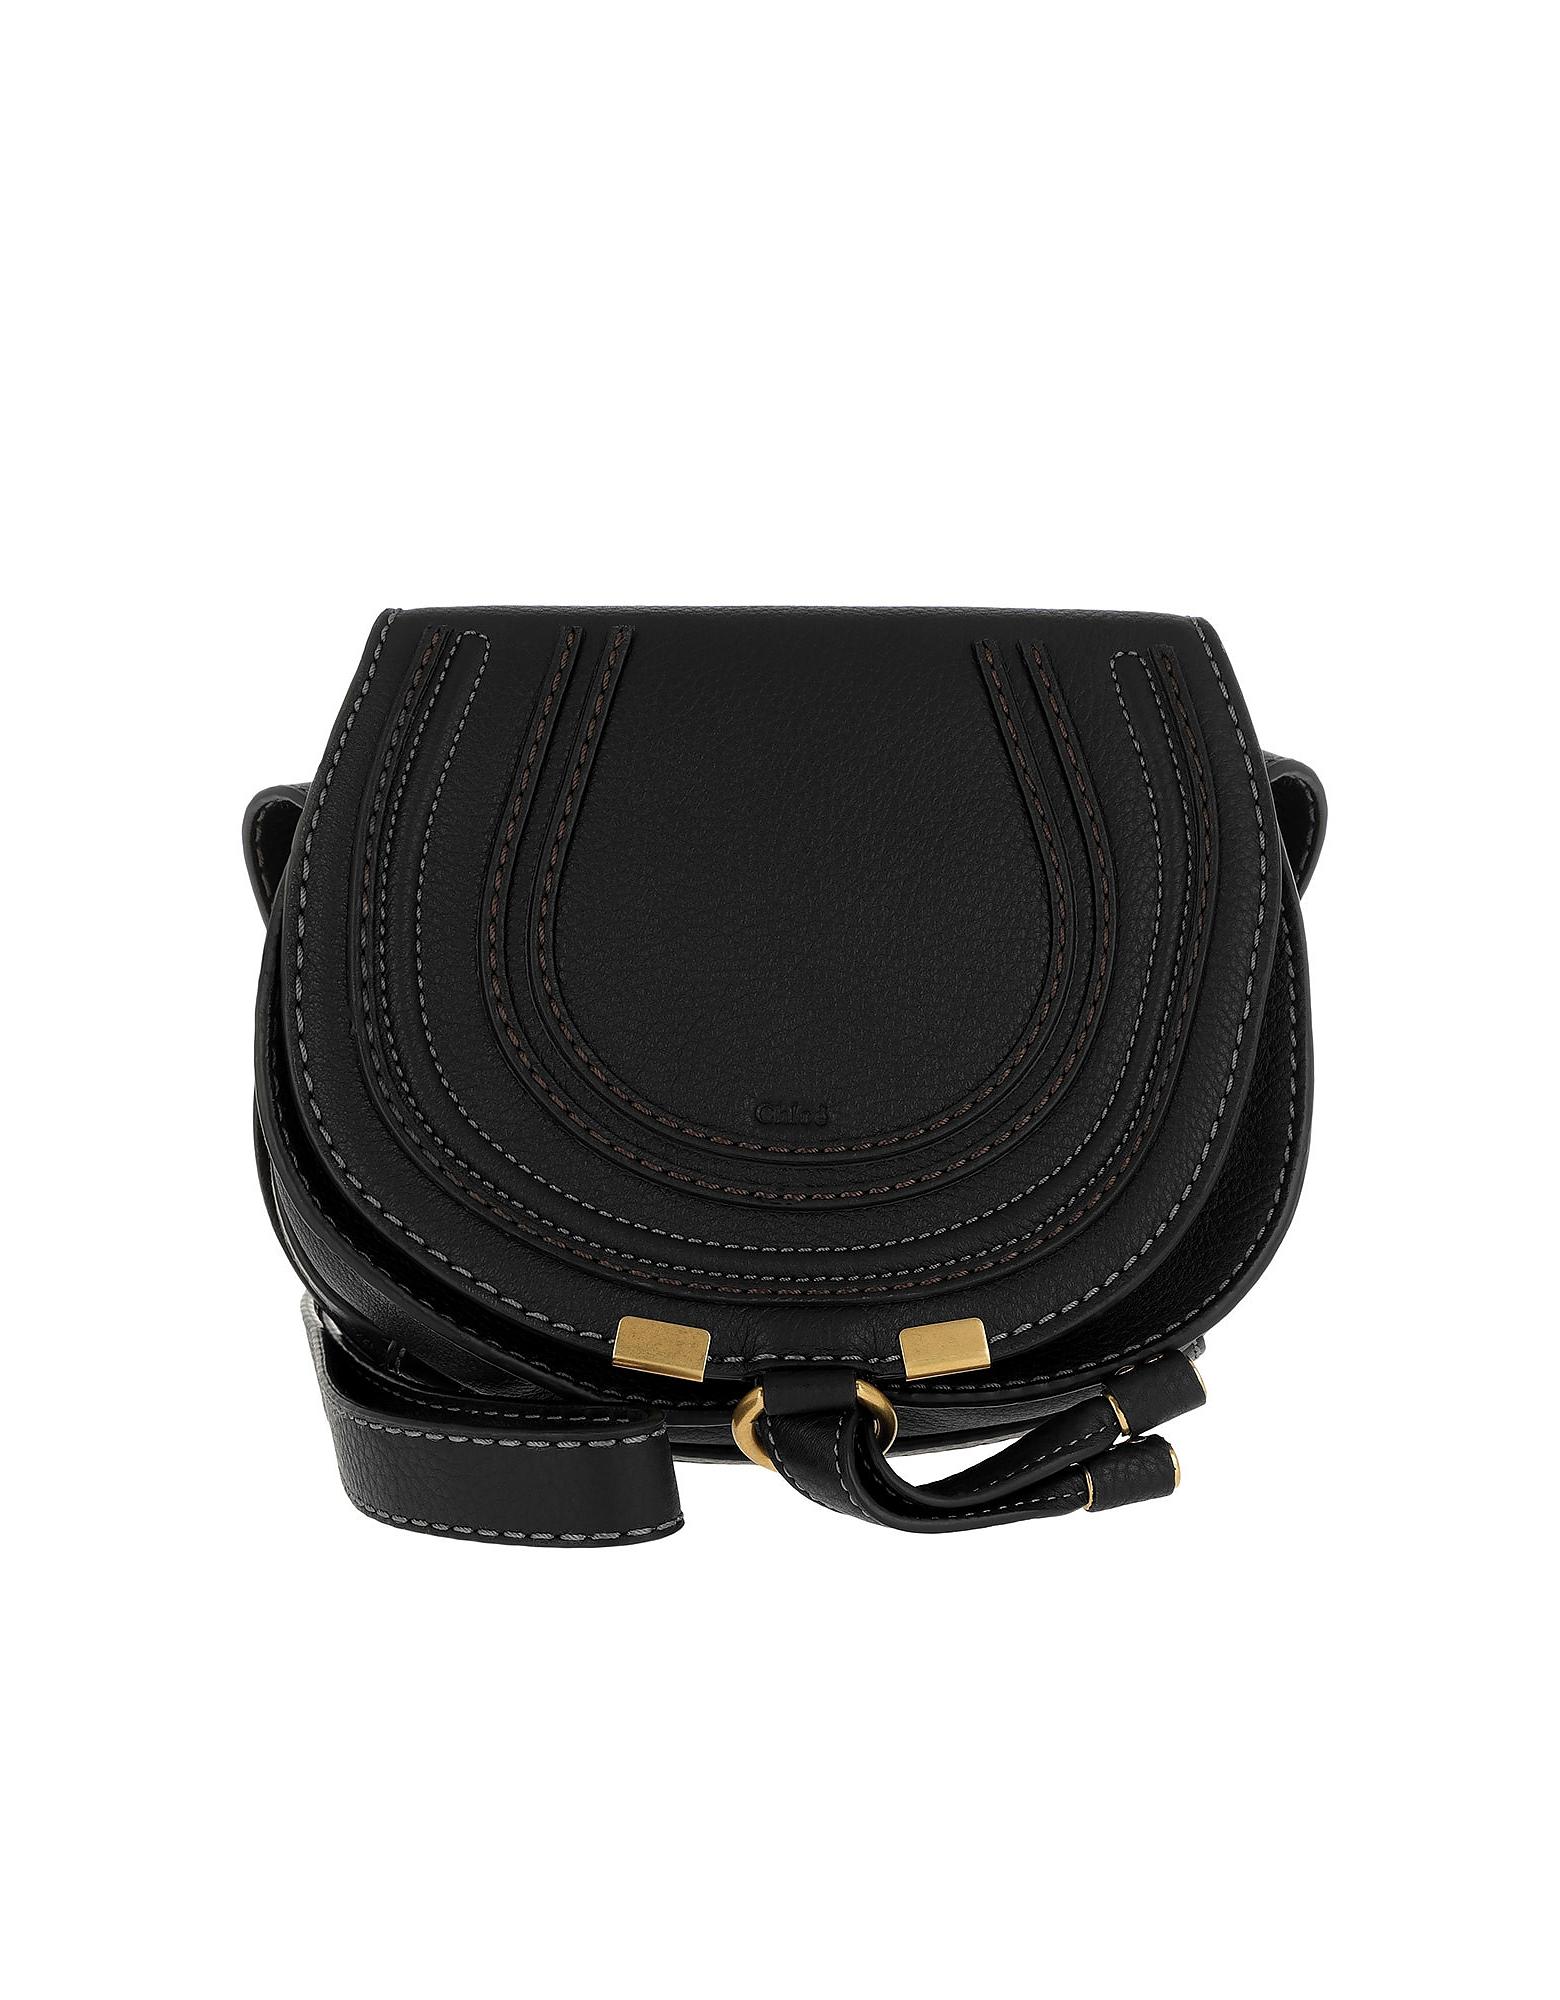 Chloe Designer Handbags, Marcie Crossbody Small Black (Luggage & Bags) photo